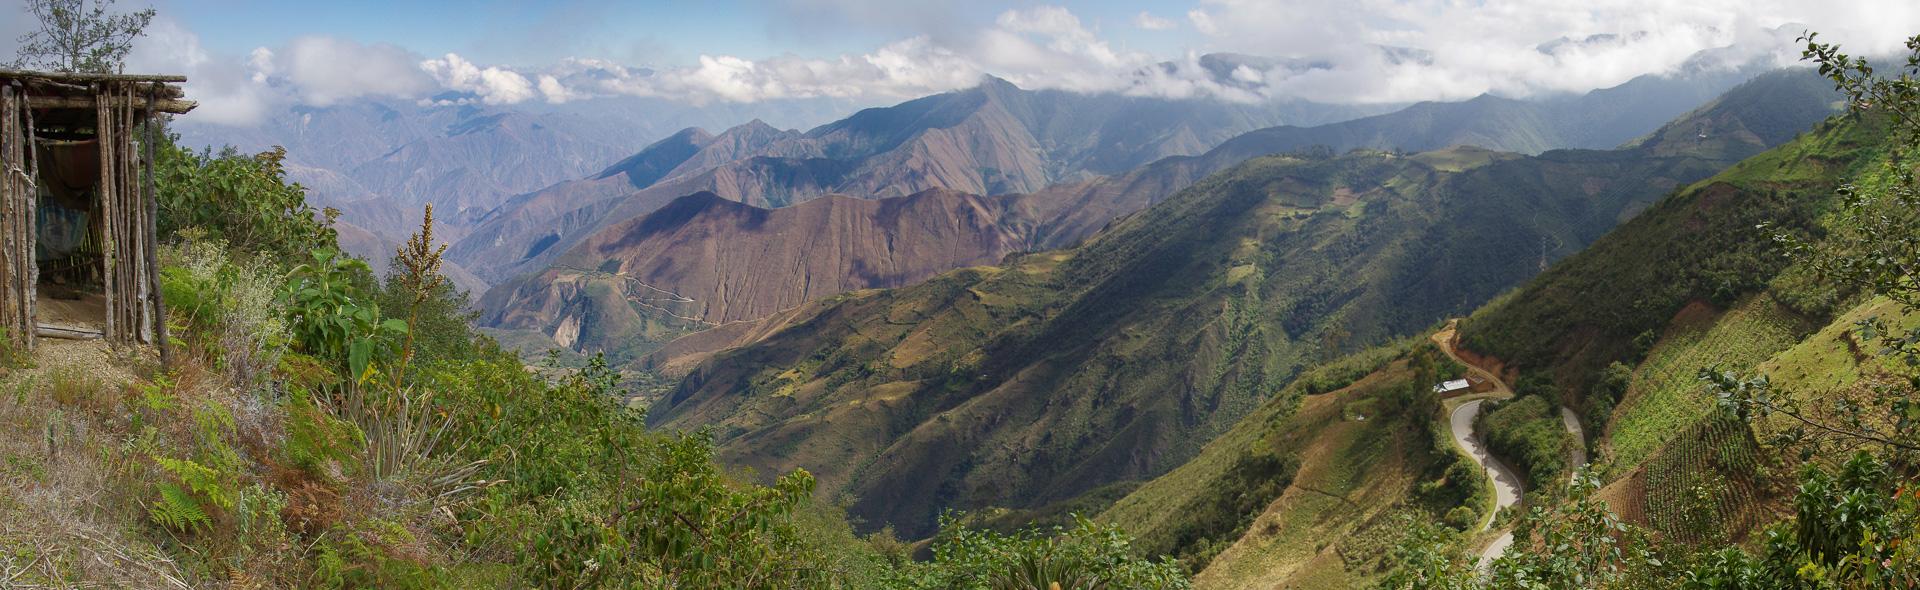 Abenteuer in den Anden Perus